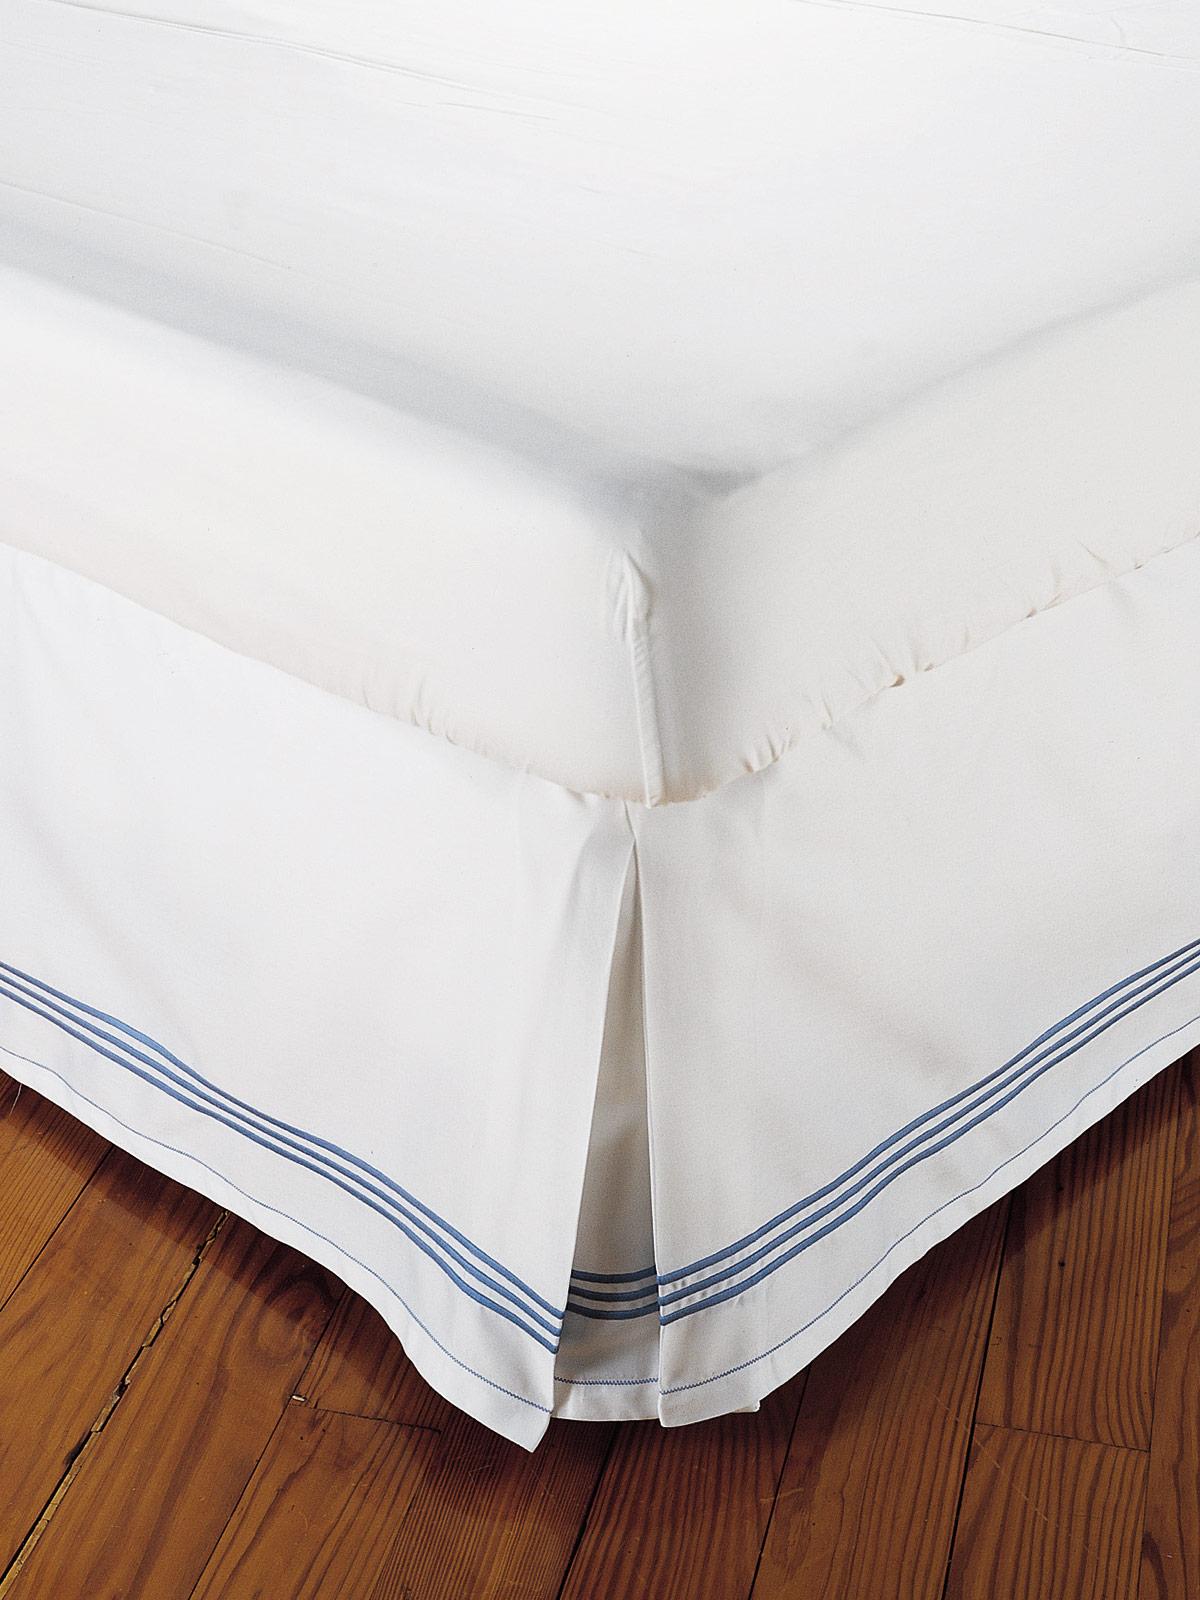 Hampton Court Dust Ruffles Luxury Bedding Italian Bed